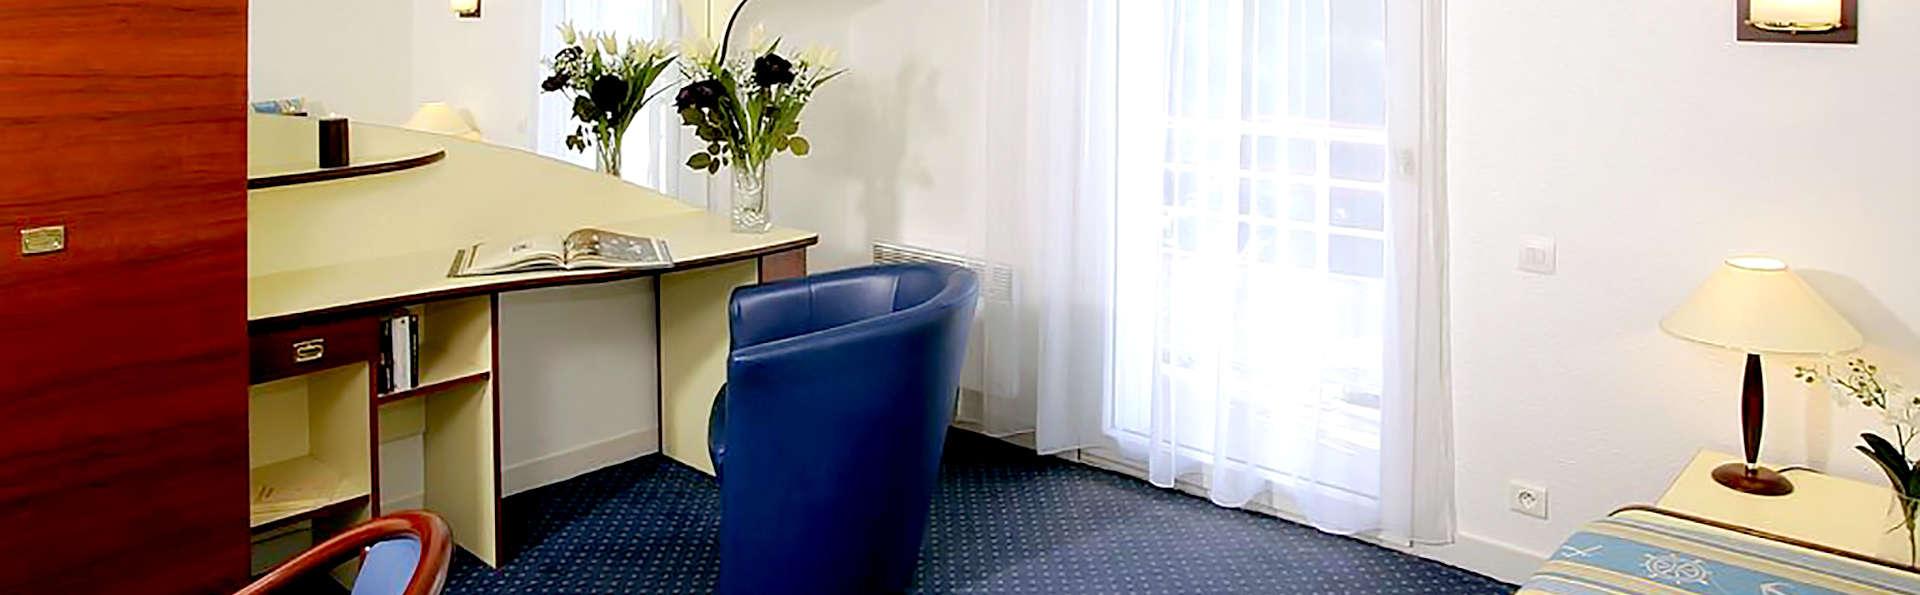 Résidence Terres de France Brest - Edit_Apartment2.jpg